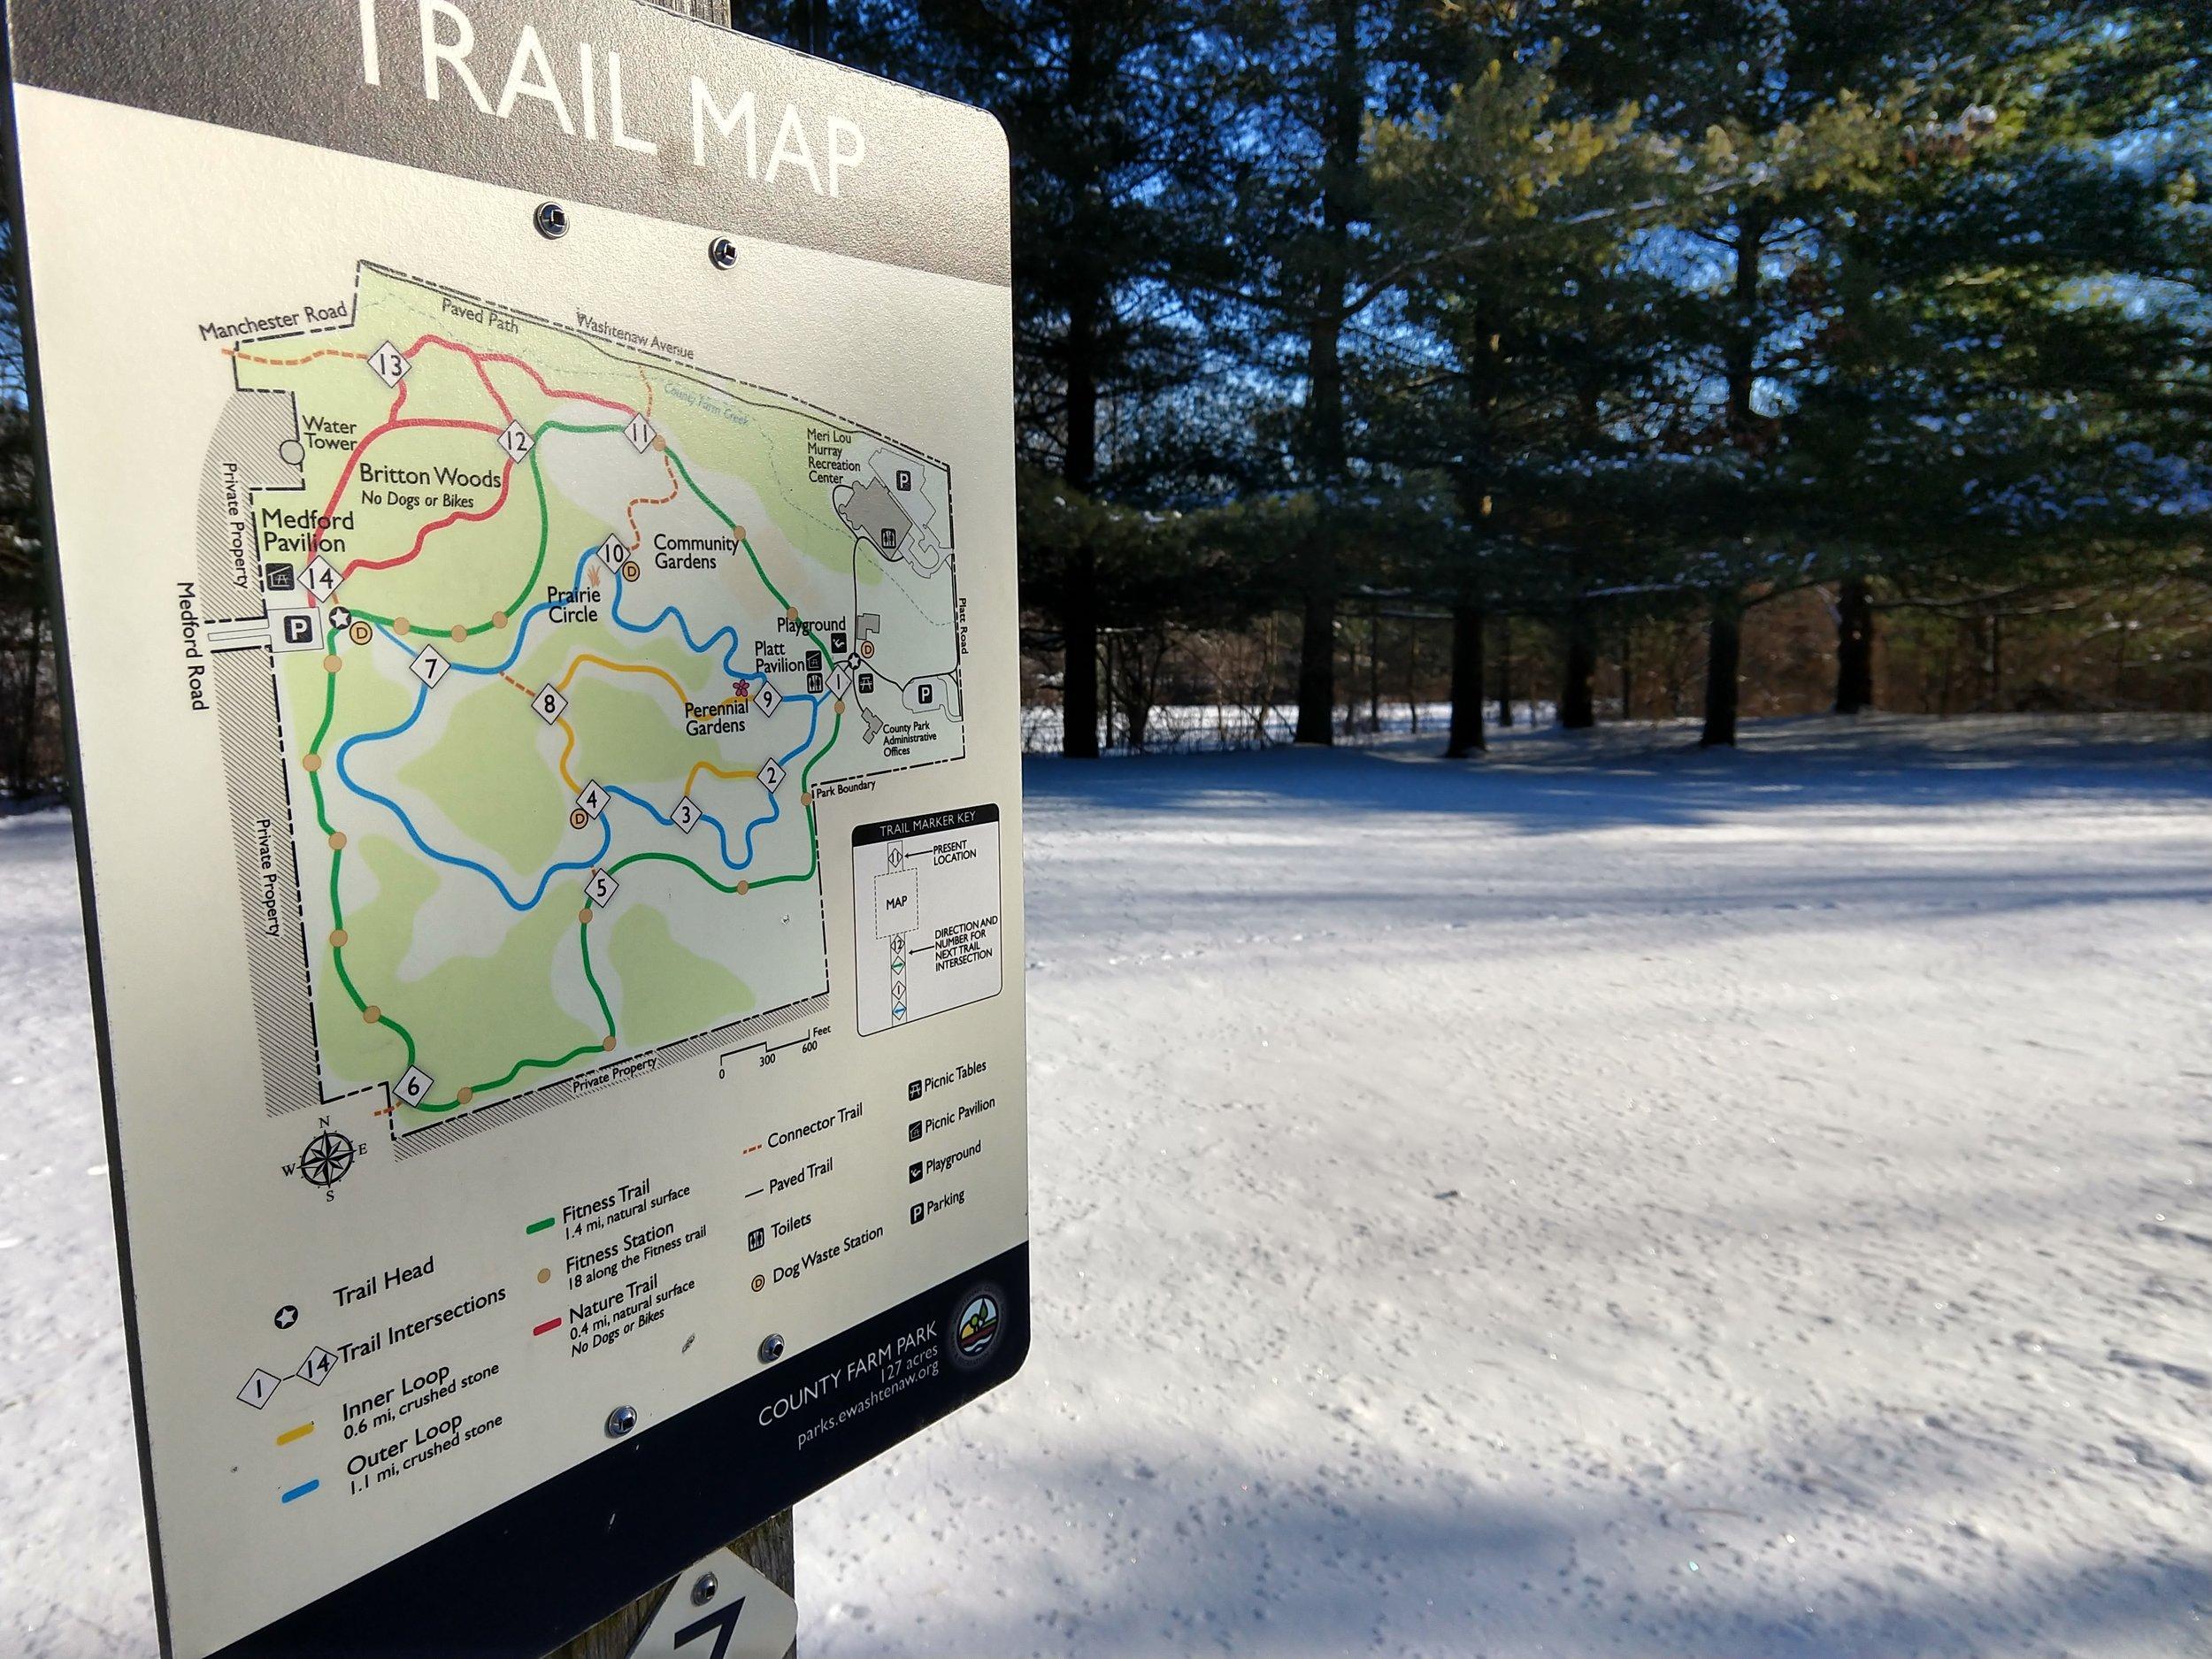 Trail Map sign County Farm Park.jpg